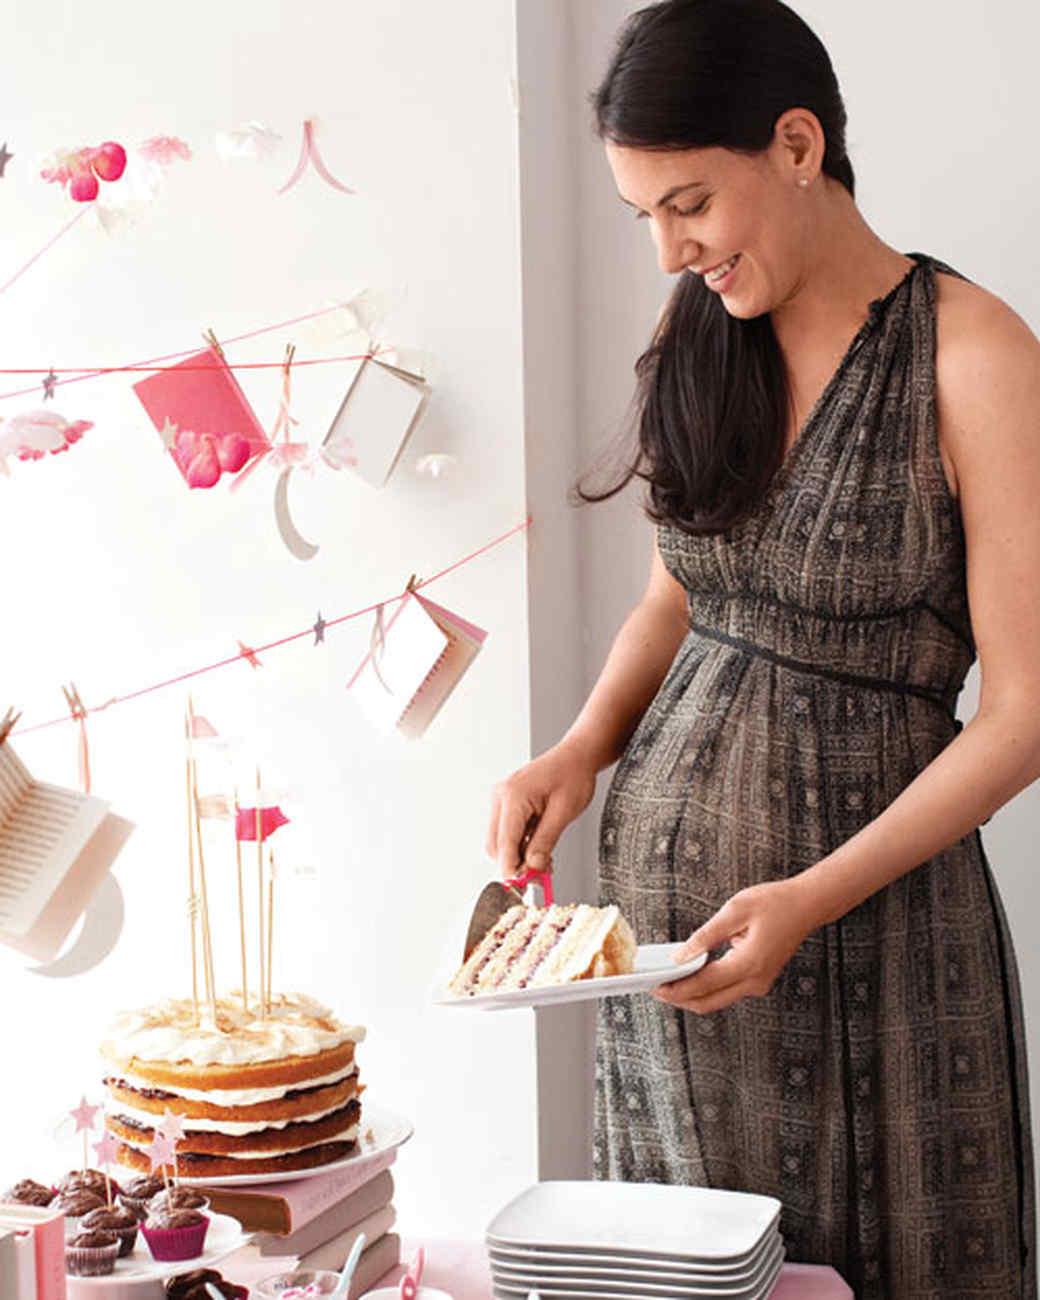 babyshower-cake-0511mld106104.jpg